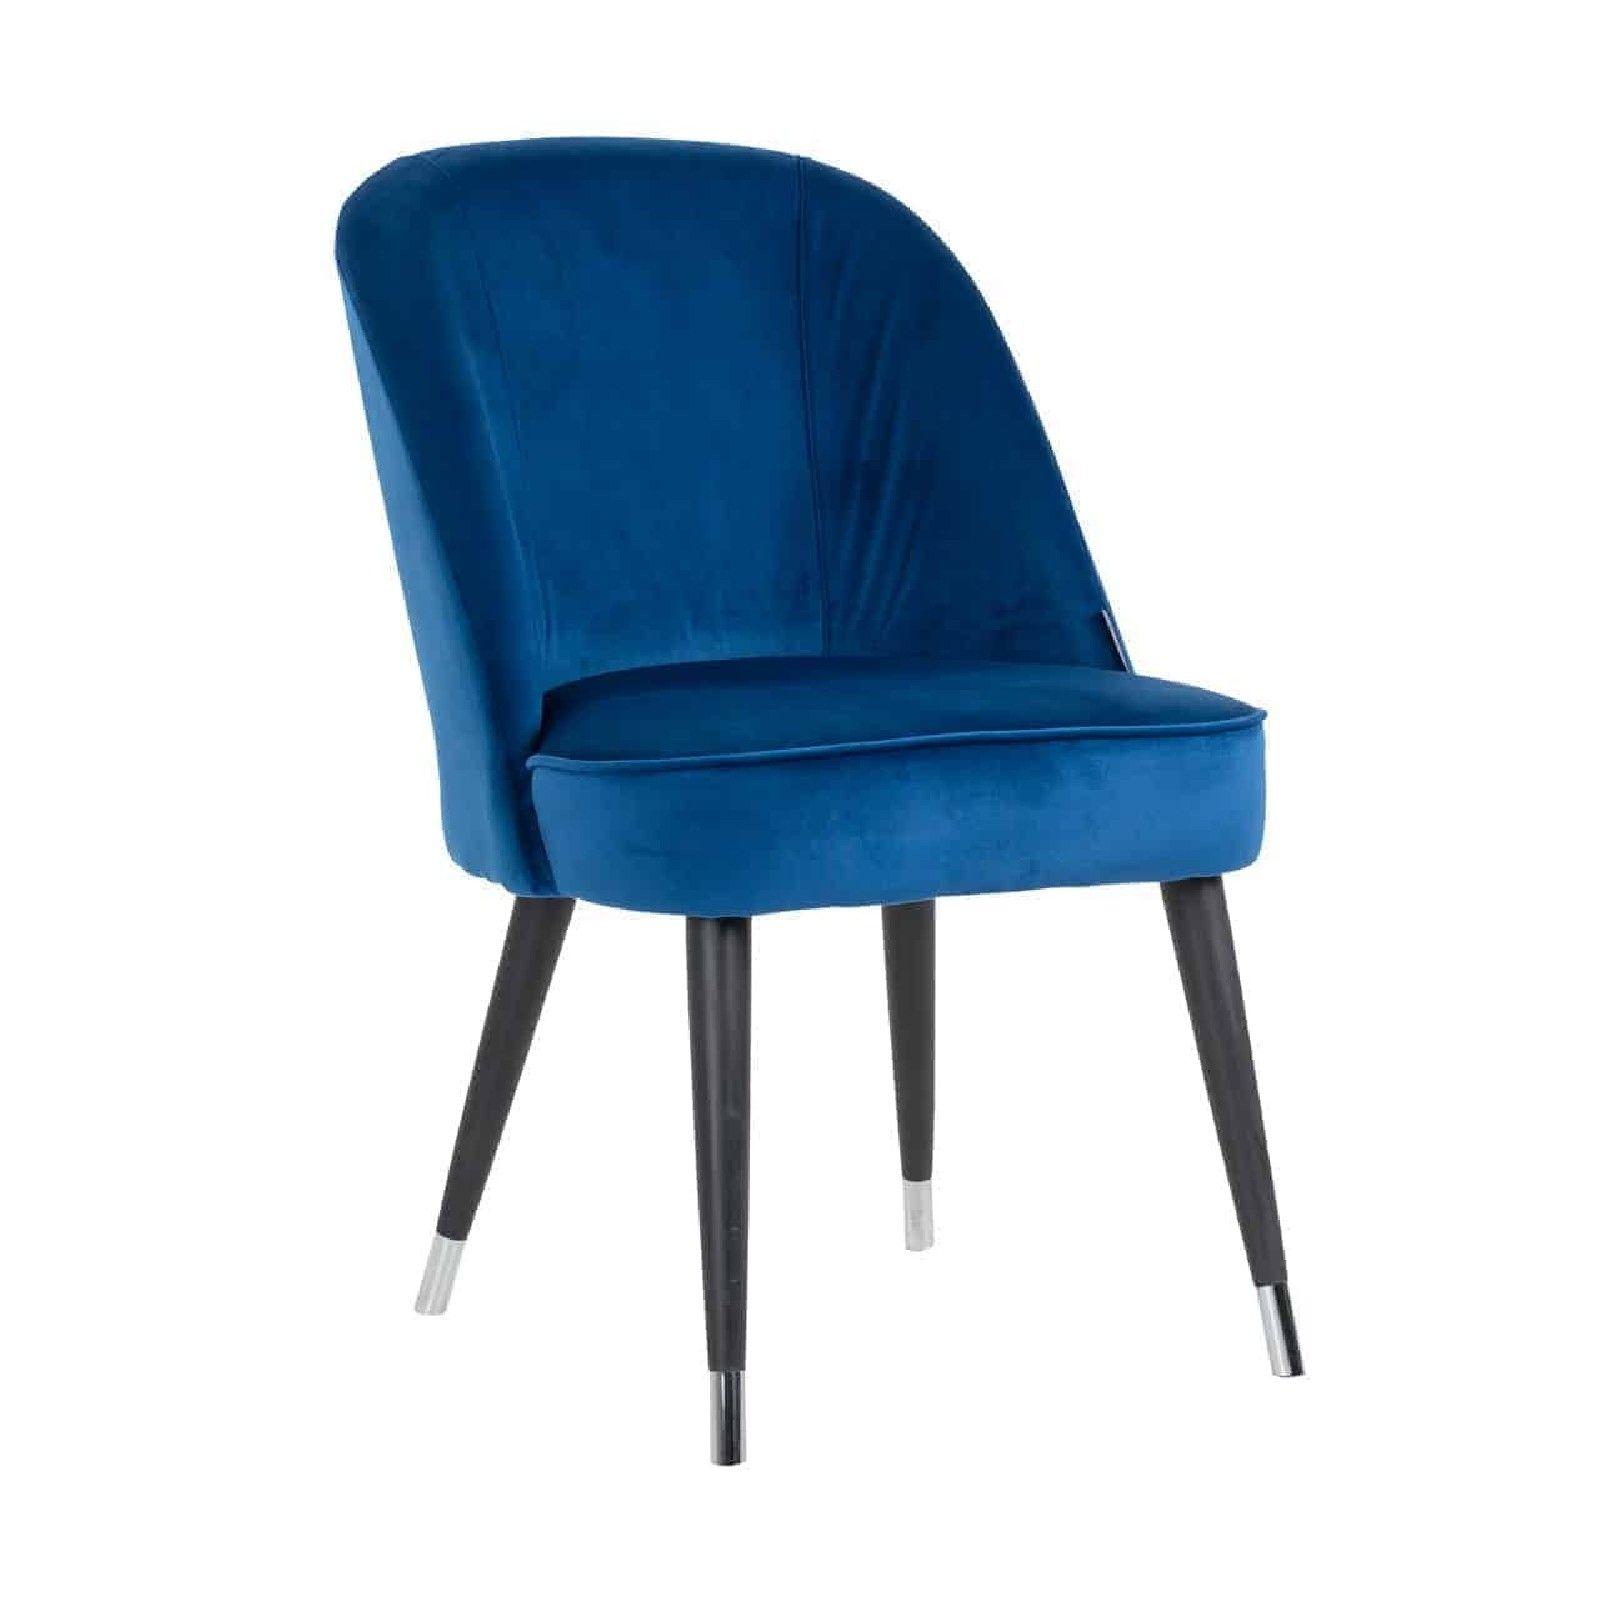 Chaise Julius, Fire Retardant Blue Velvet, Silver footcap Salle à manger - 12